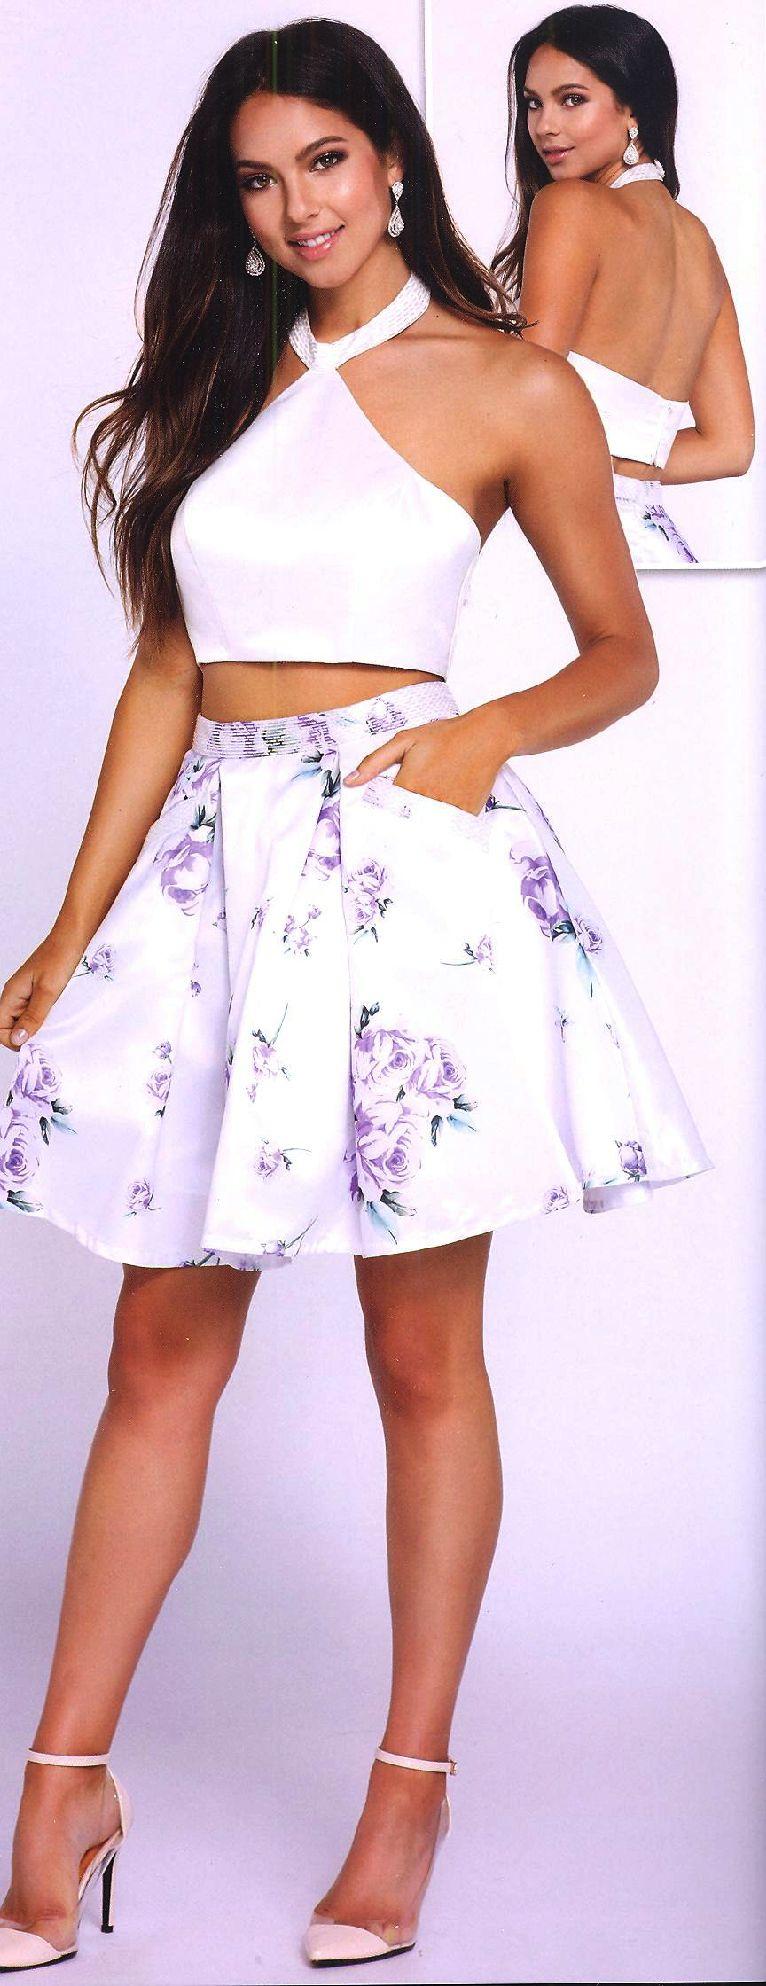 Teo piece homecoming dresses sweet dresses underu mini vestido